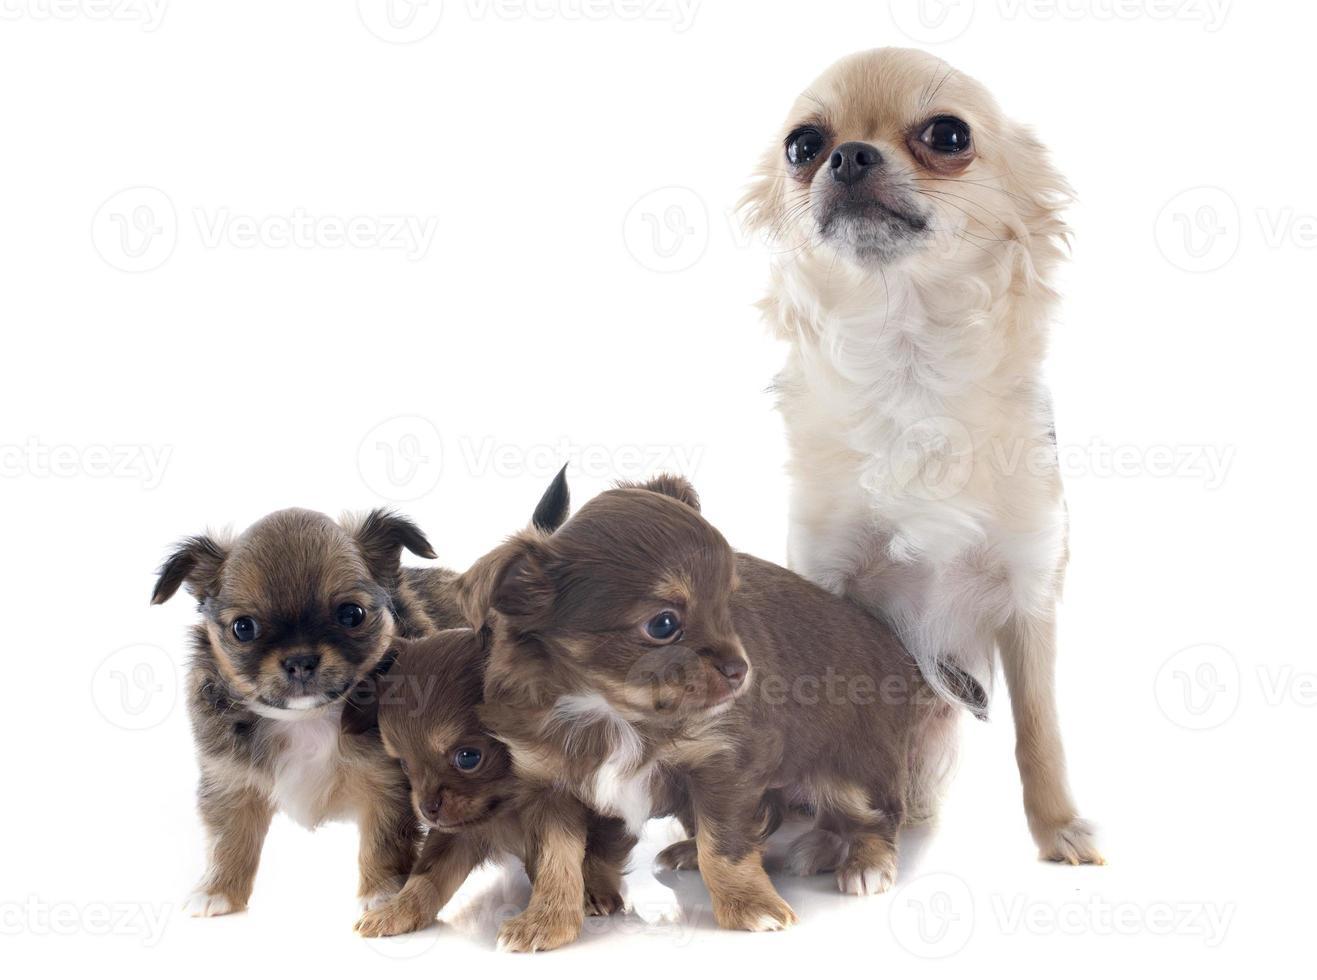 cachorros y chihuahua adulto foto